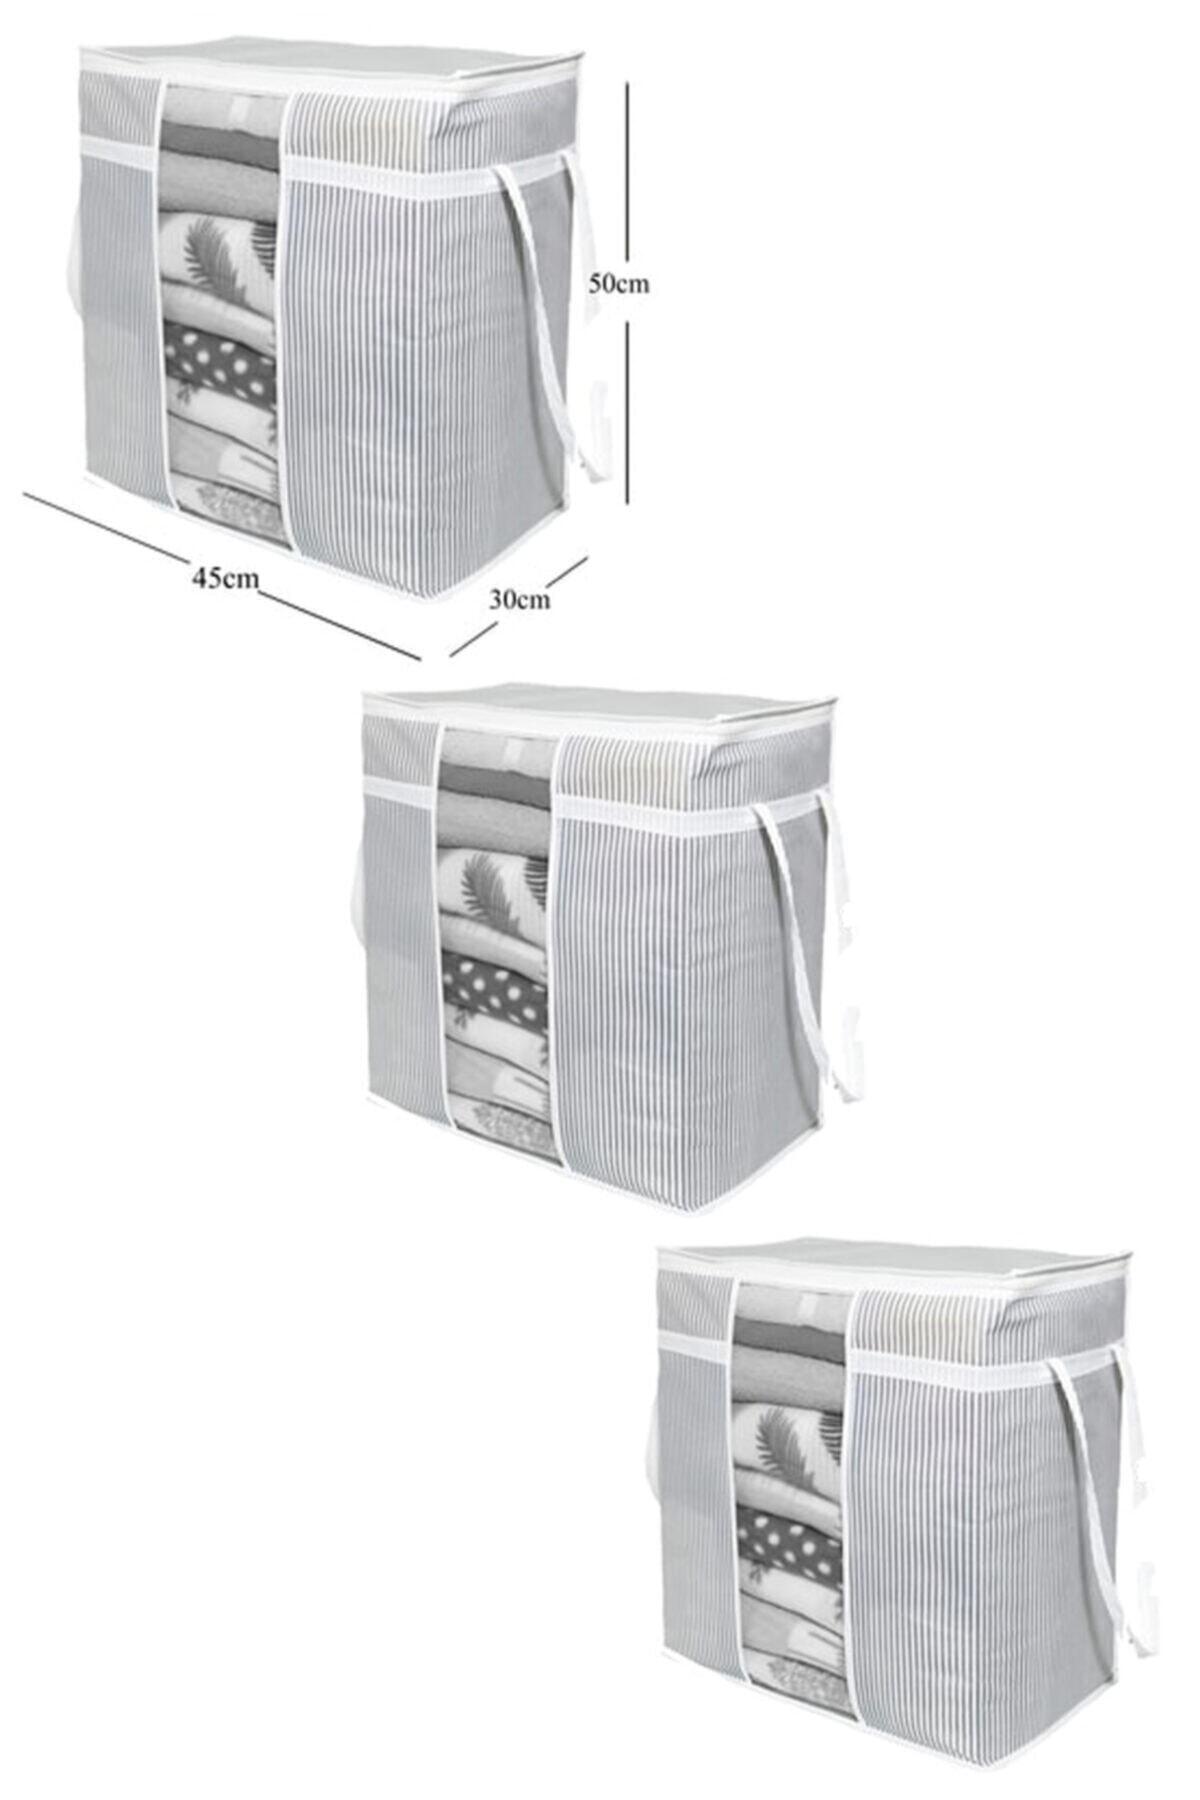 BTS Shop 3 Adet - Pencereli Saklama Çantası Çizgili 50x45x30cm 1